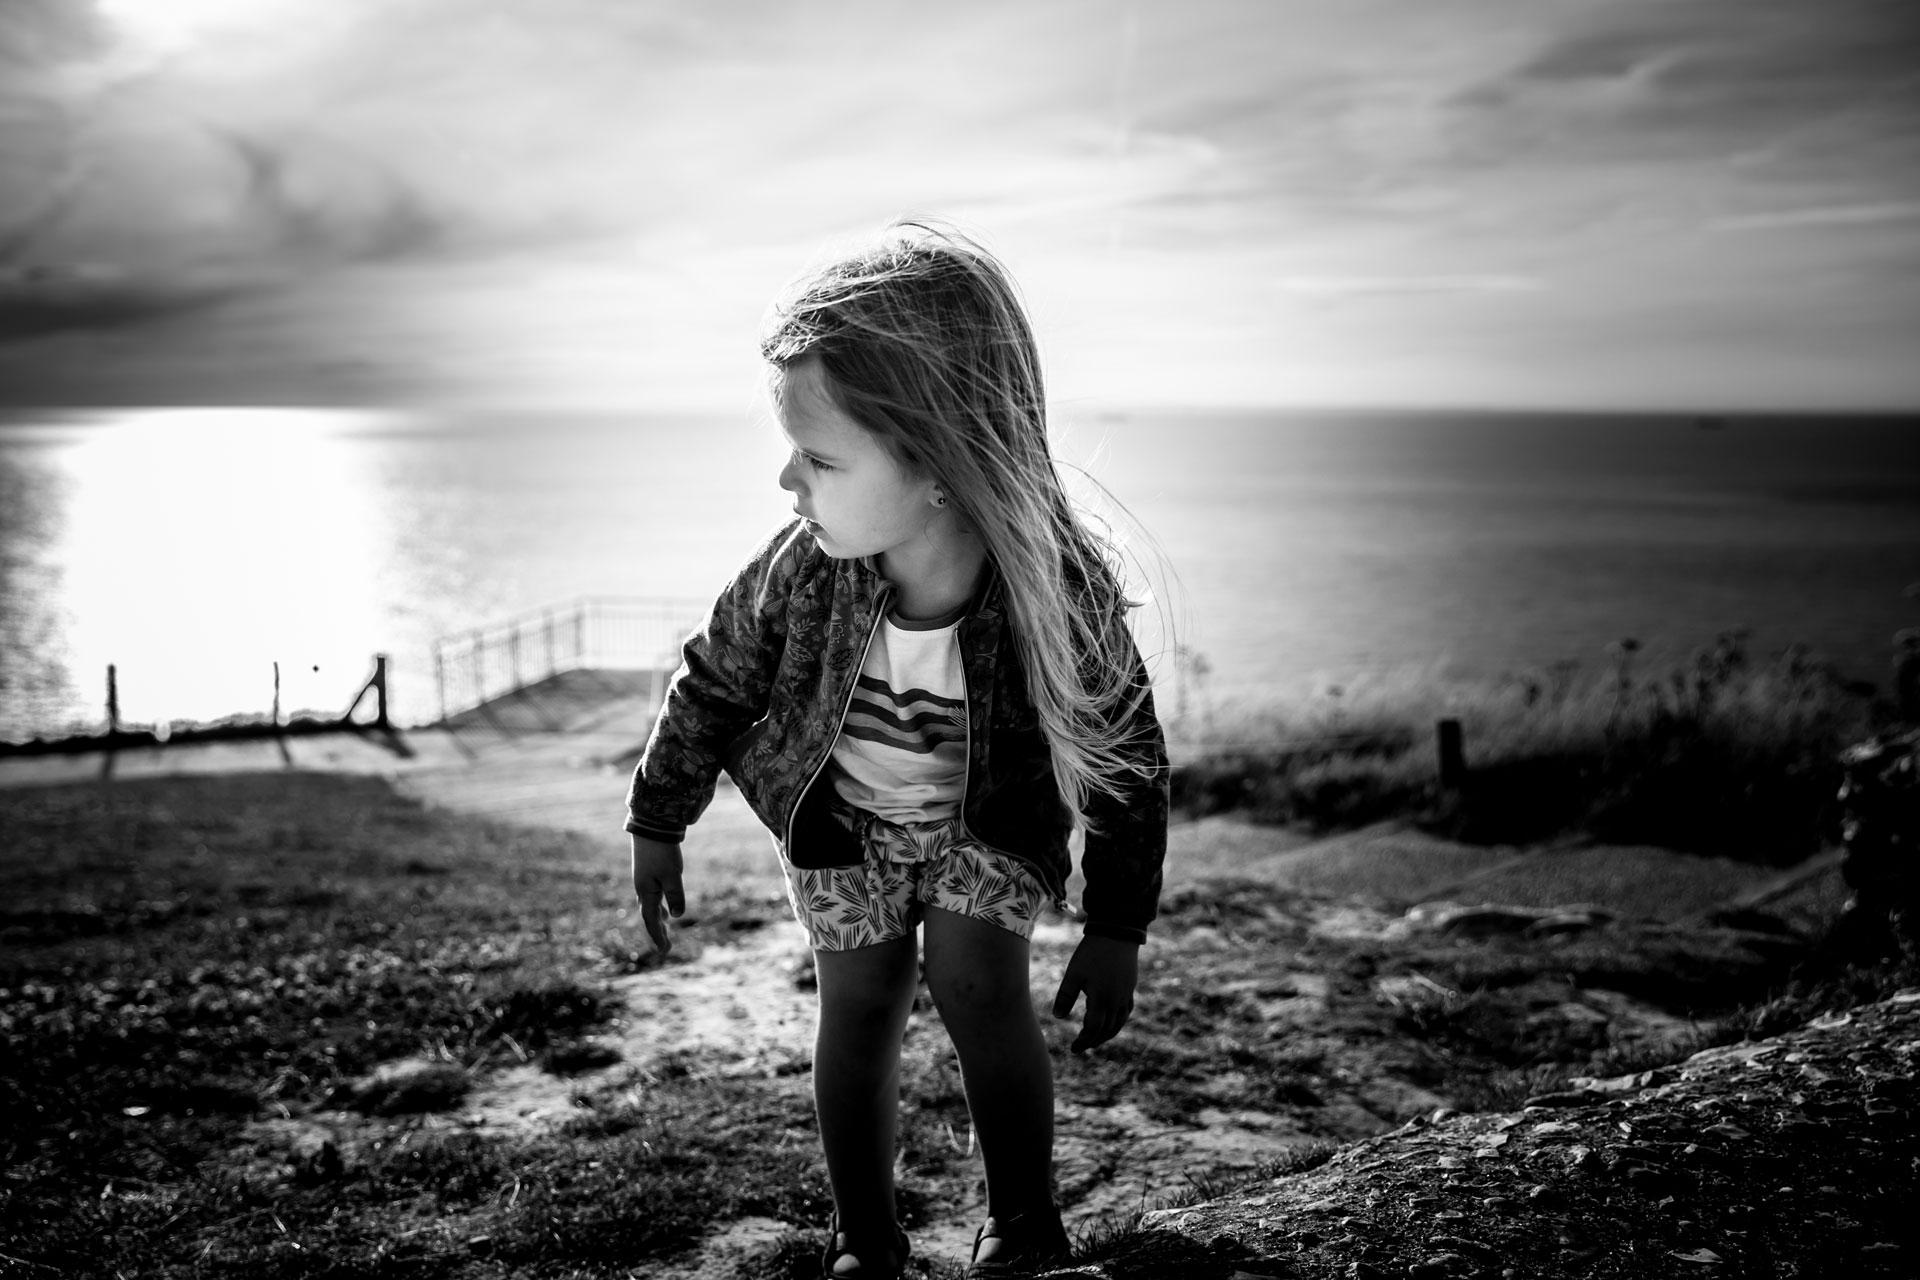 particuliers-portraits-famille-chauveau-mary-2020-013